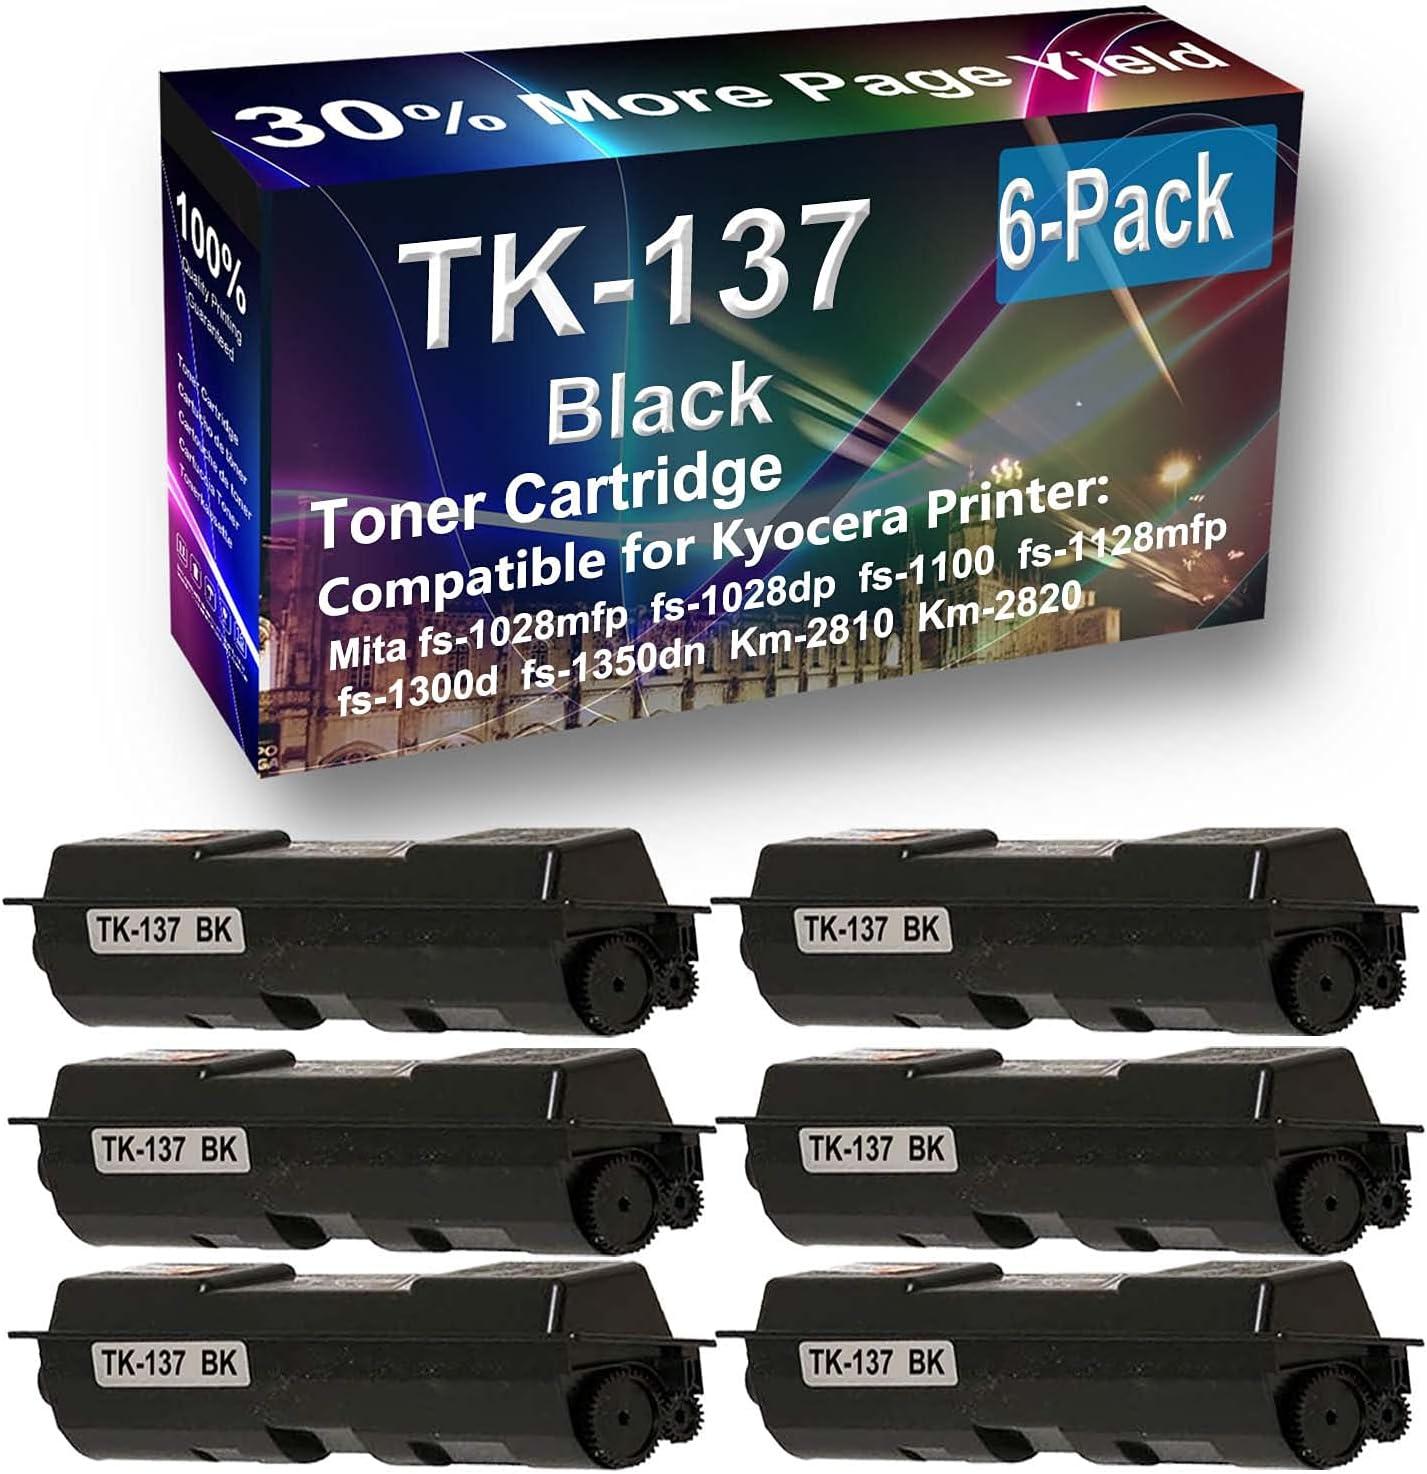 6-Pack Compatible High Yield Km-2810, Km-2820 Printer Cartridge Replacement for Kyocera Mita TK137 (TK-137) Toner Cartridge (Black)